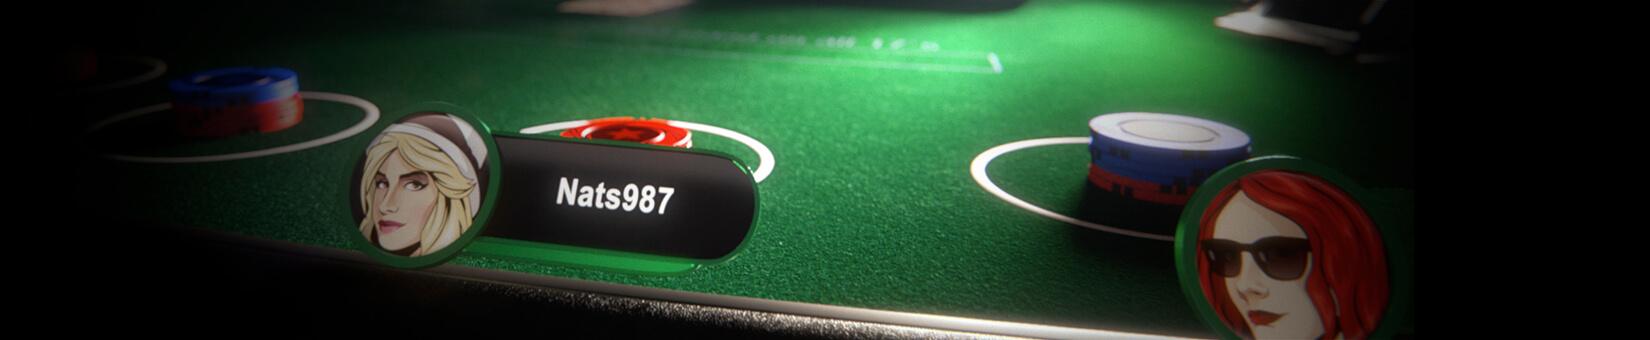 Pokerstars Casino Aktionen - 592864